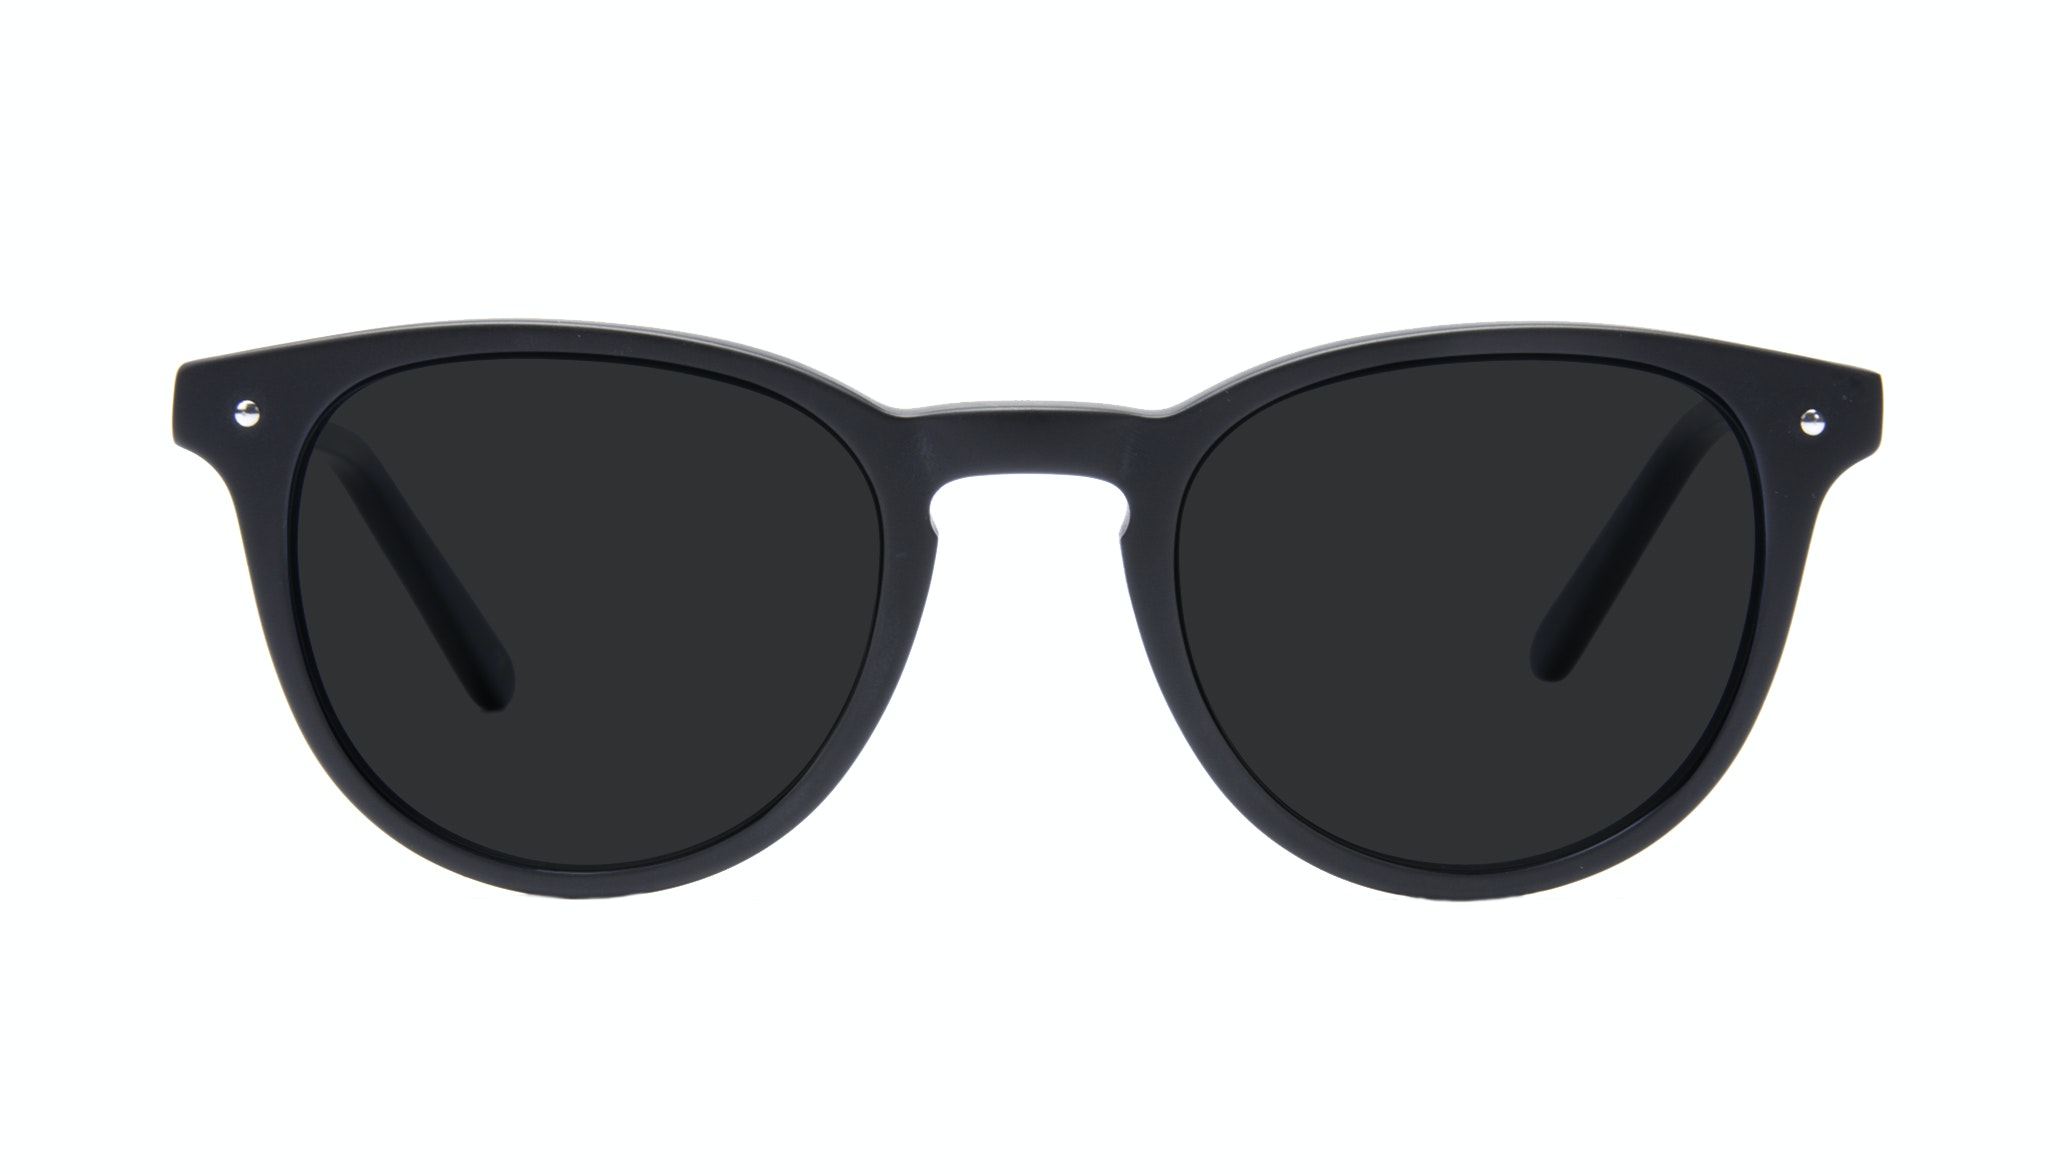 Affordable Fashion Glasses Round Sunglasses Men Cult Matt Black